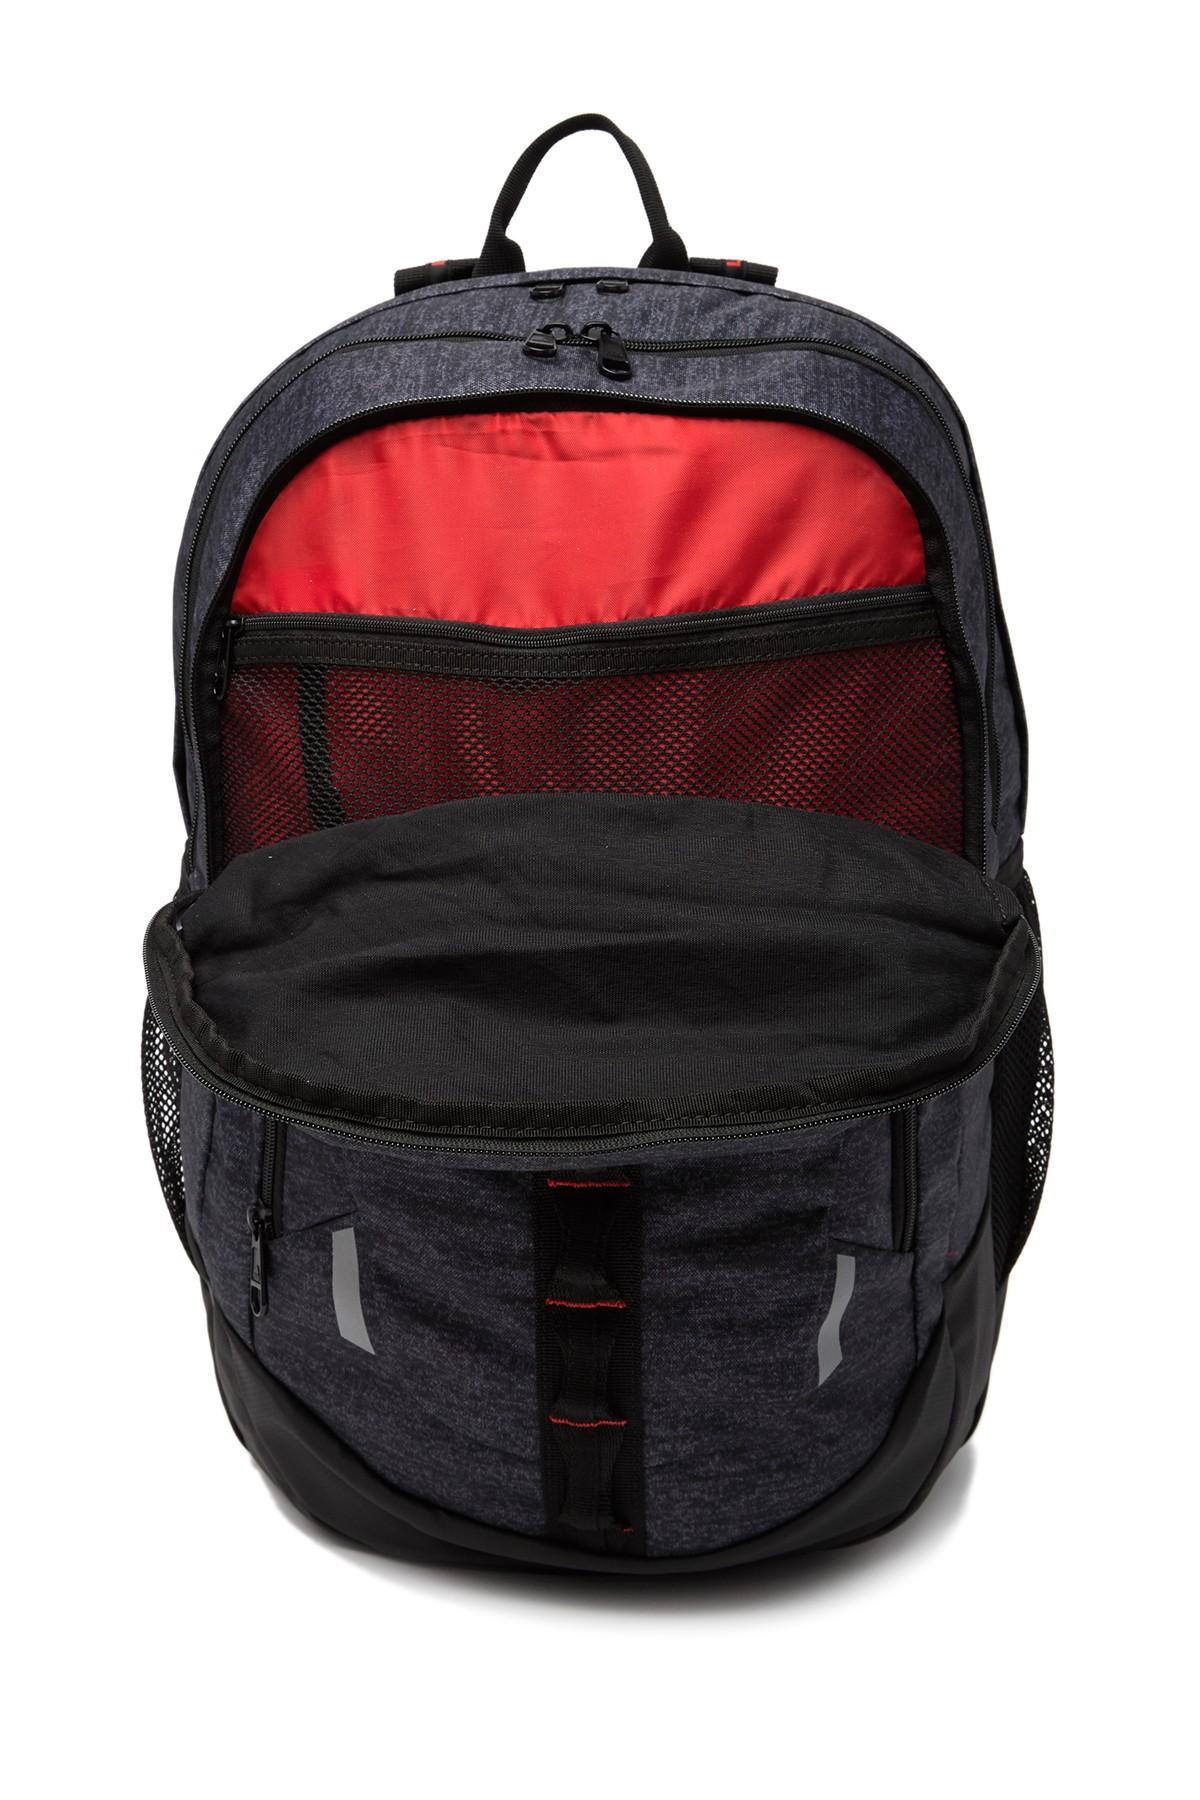 adidas Prime V Laptop Backpack Accessories in Black for Men - Lyst